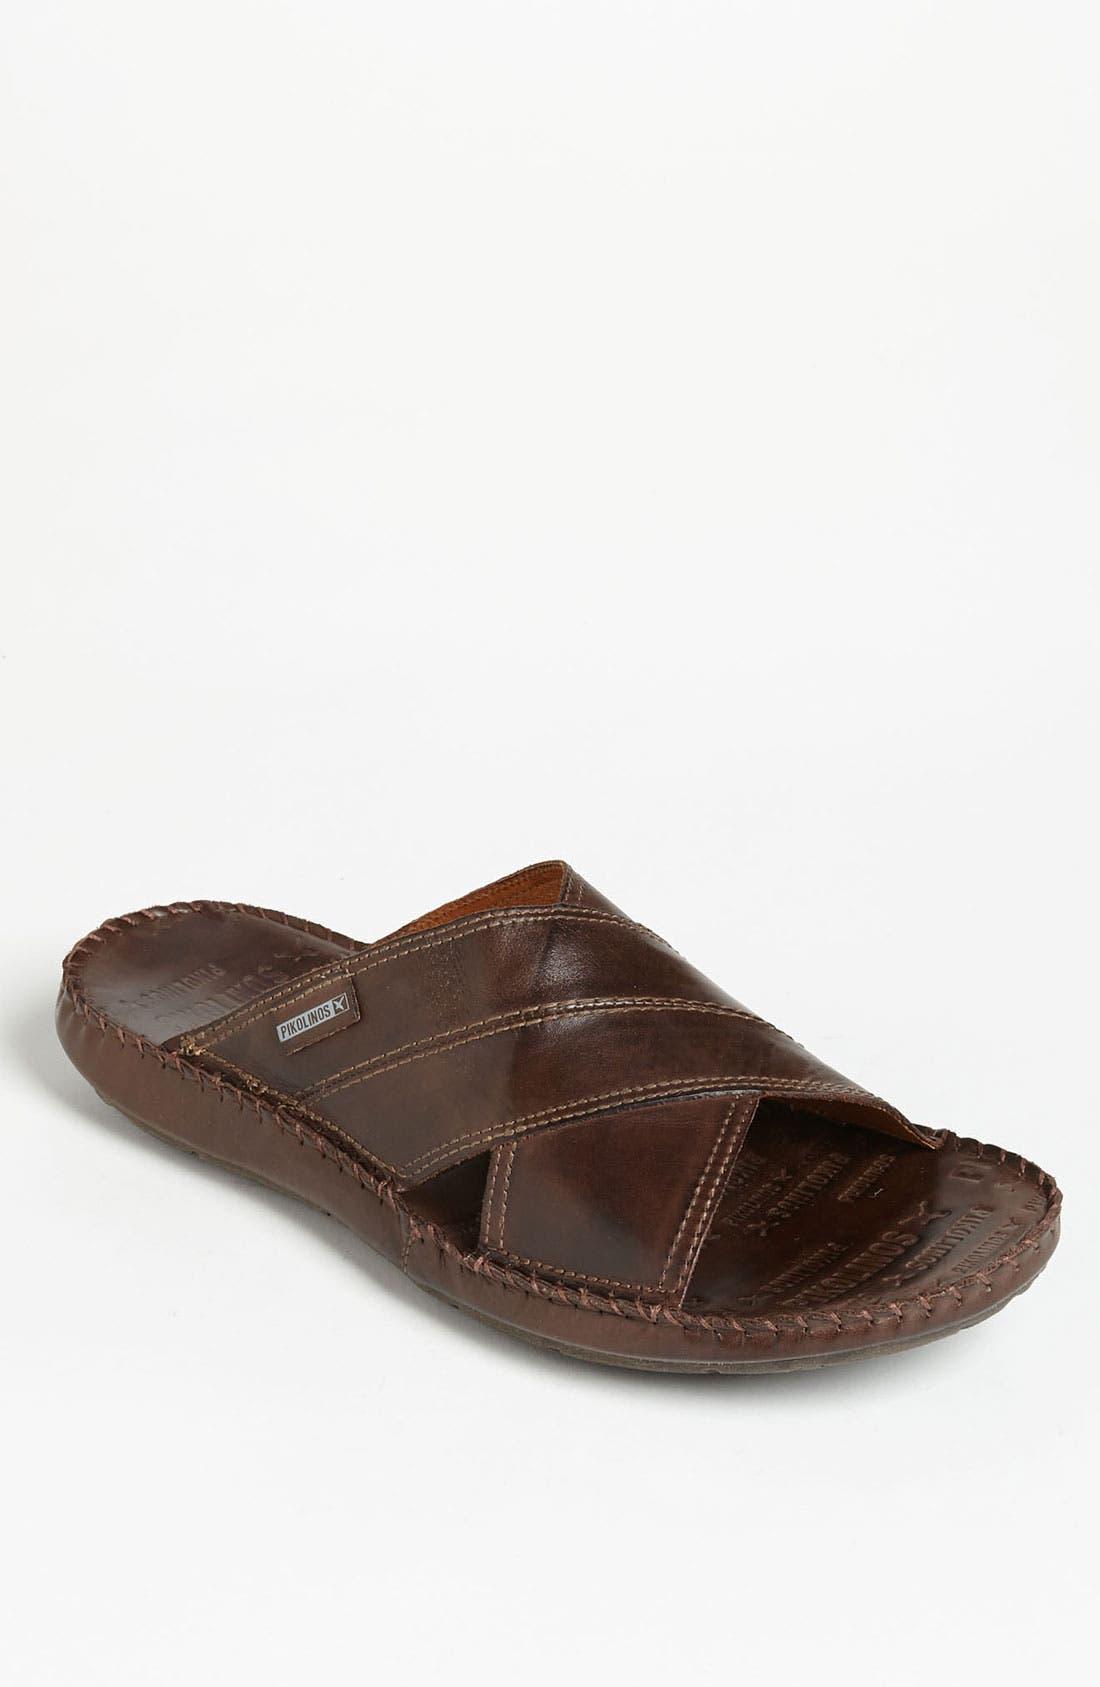 Alternate Image 1 Selected - PIKOLINOS 'Tarifa' Sandal